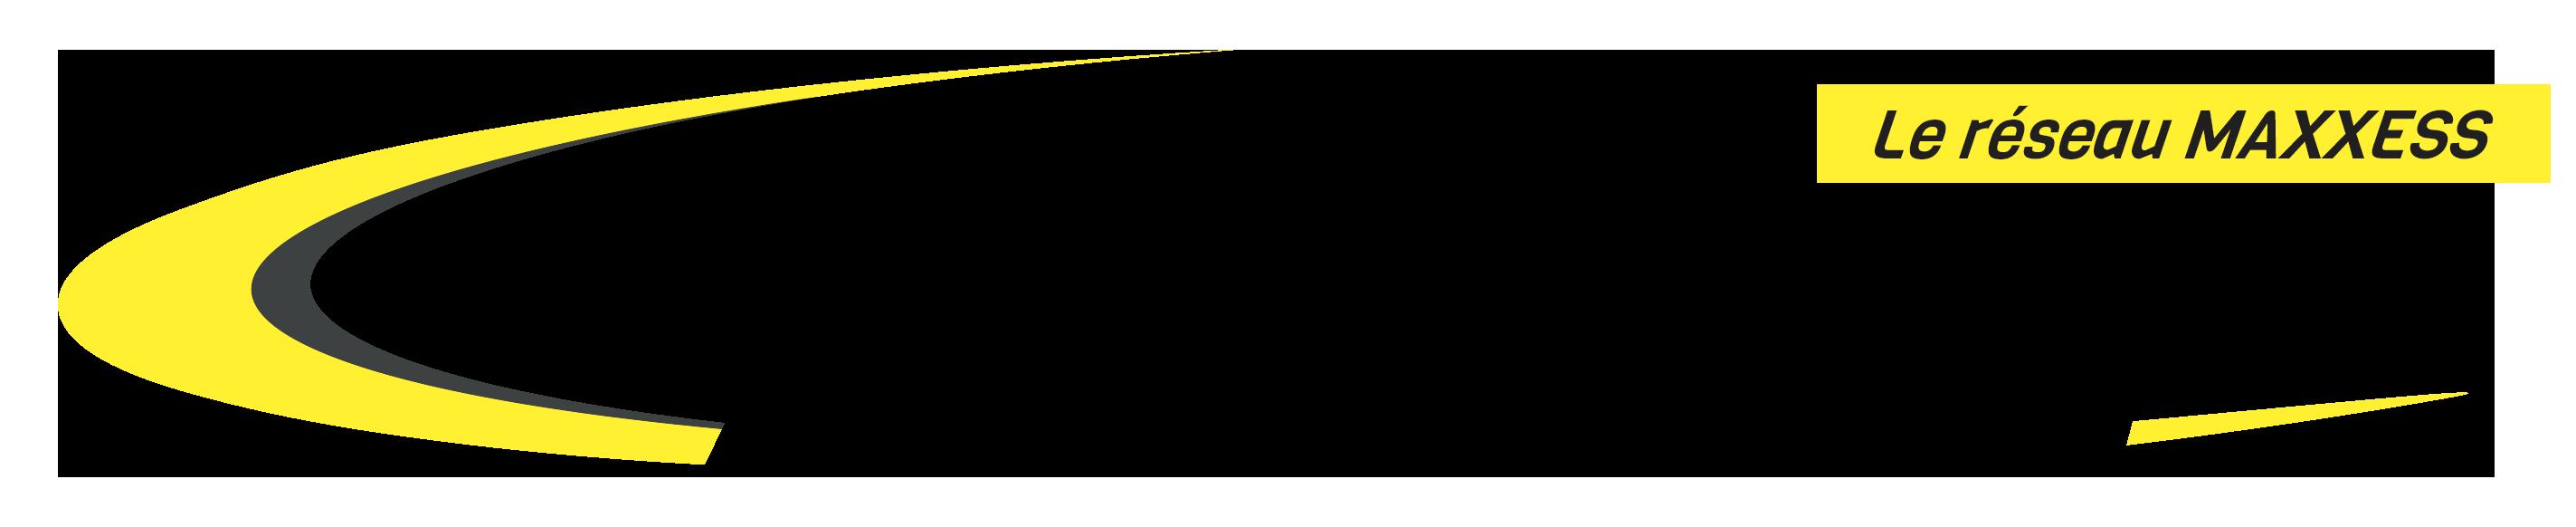 Le réseau MAXXESS FRANCE